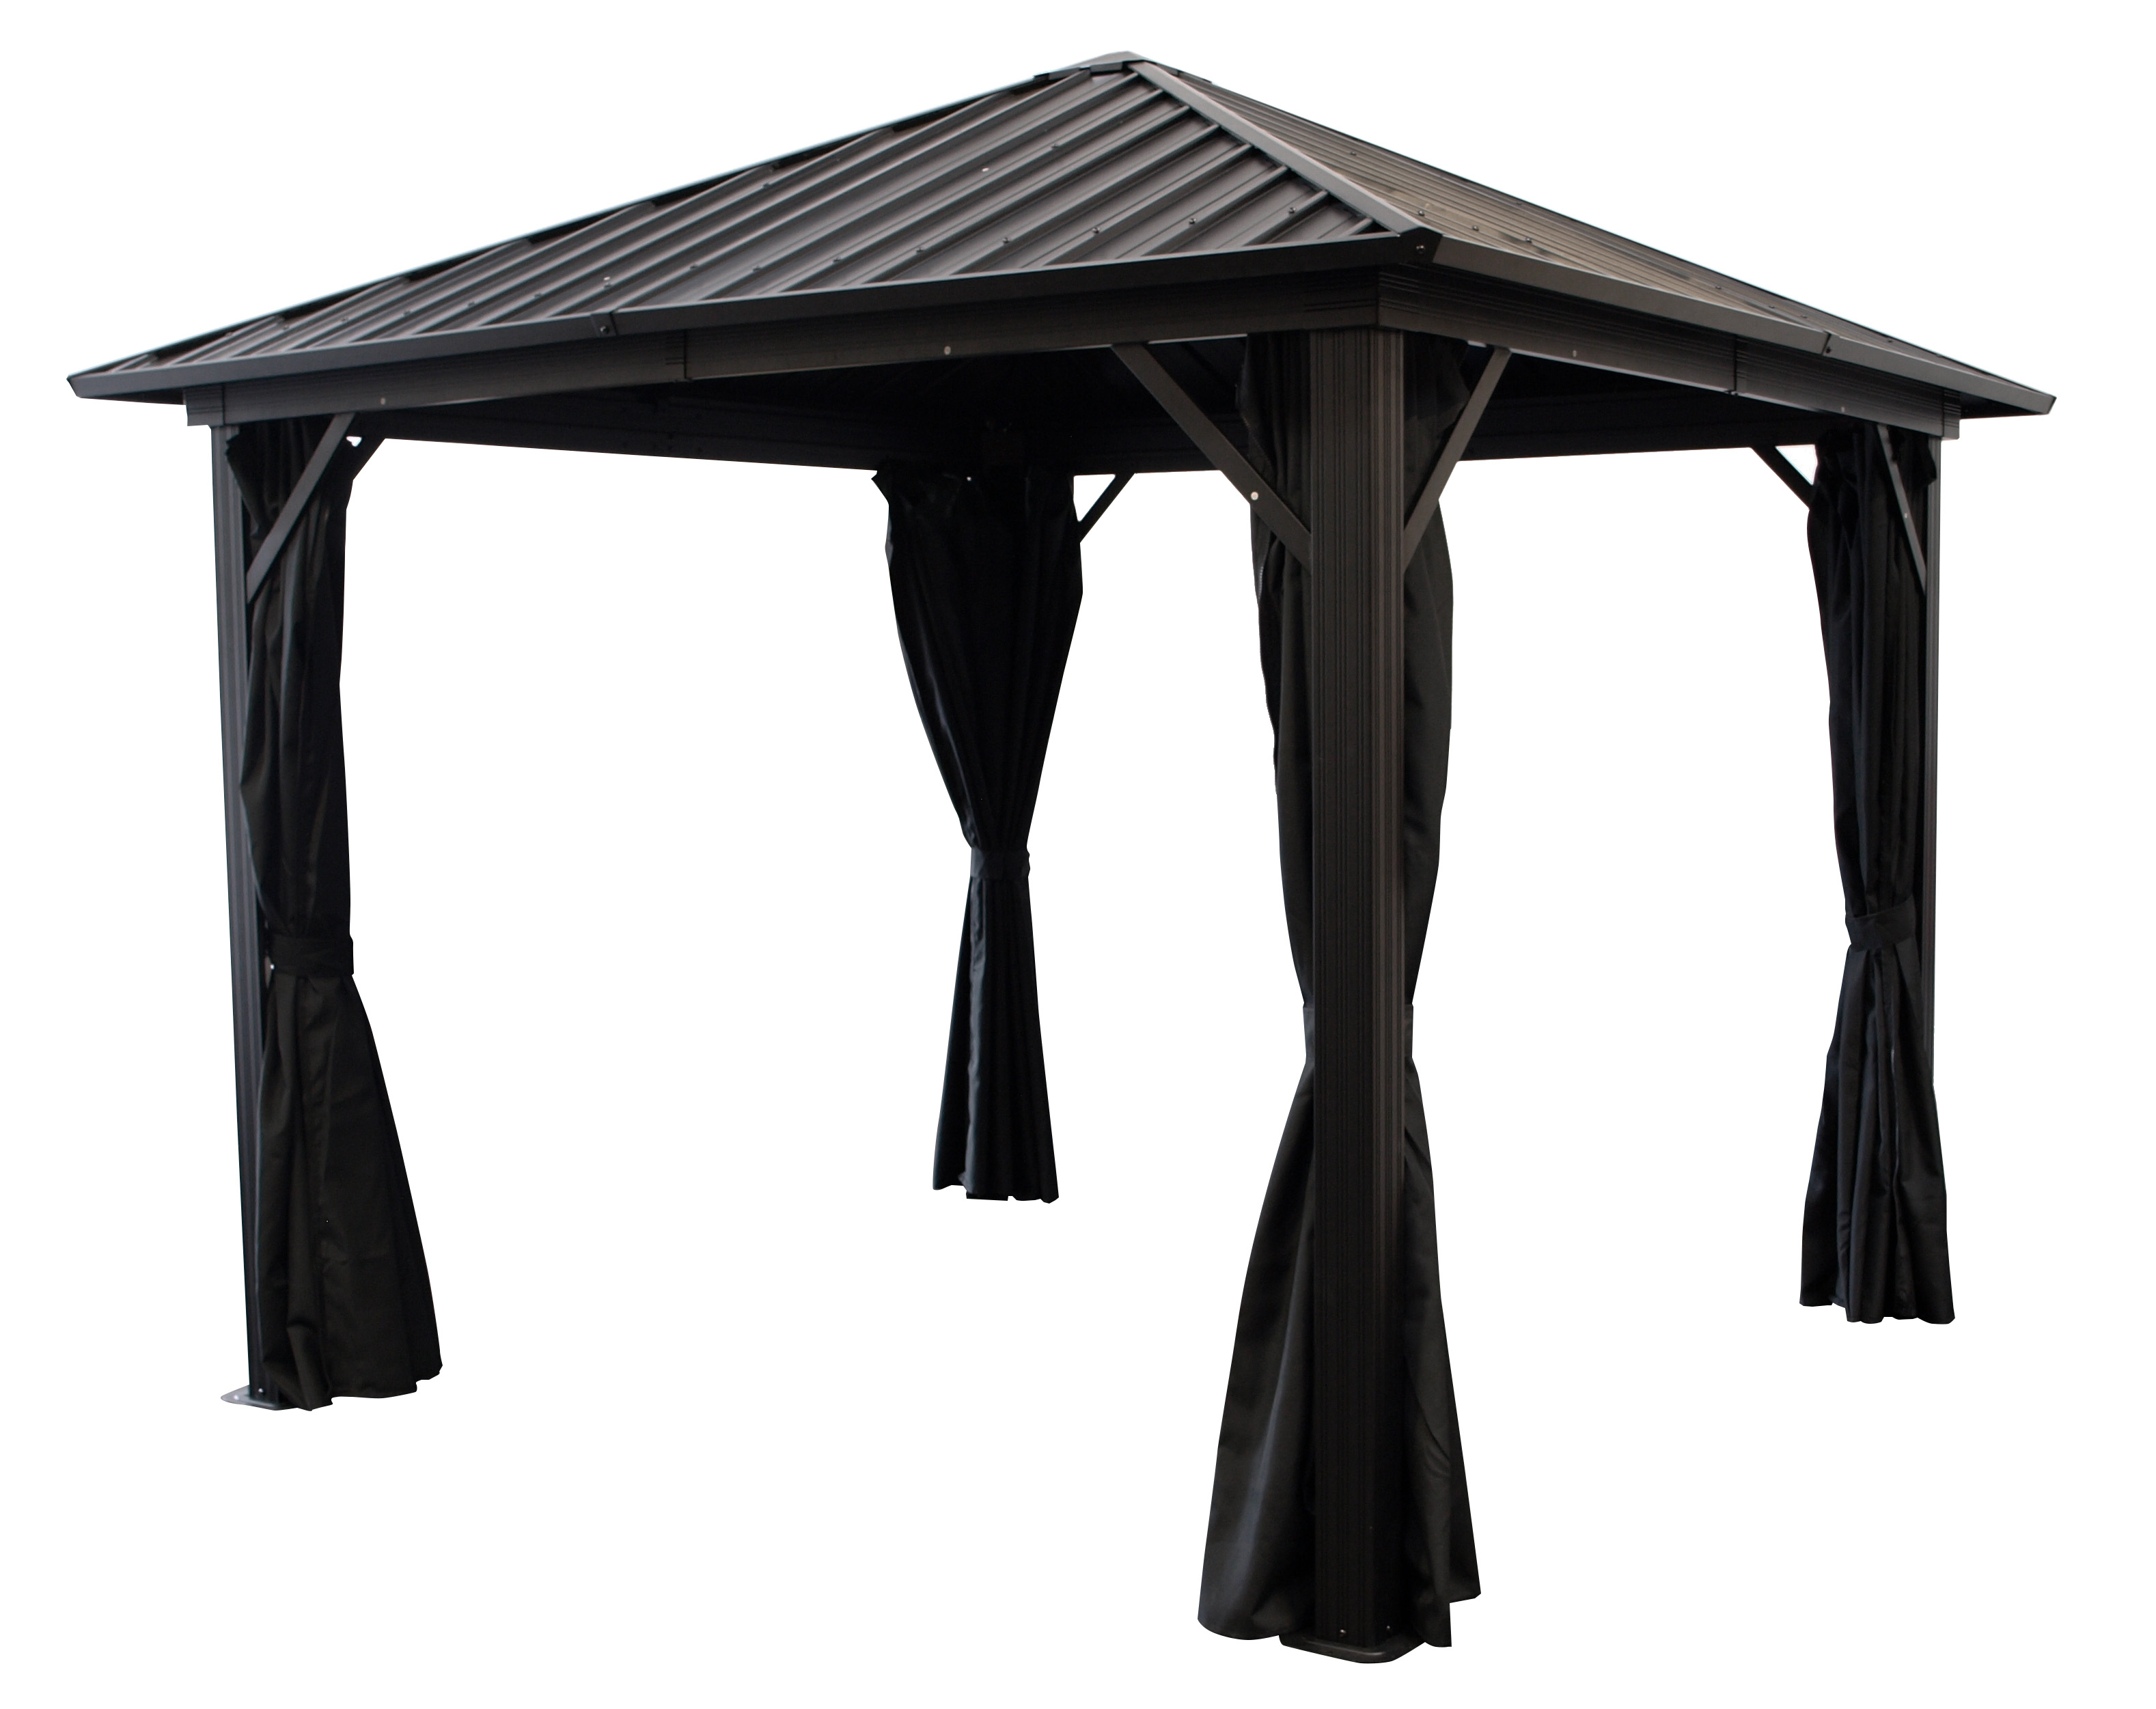 Pavillon NOVARA  3x3 Meter, Aluminium schwarz, Dach aus verzinktem Metall